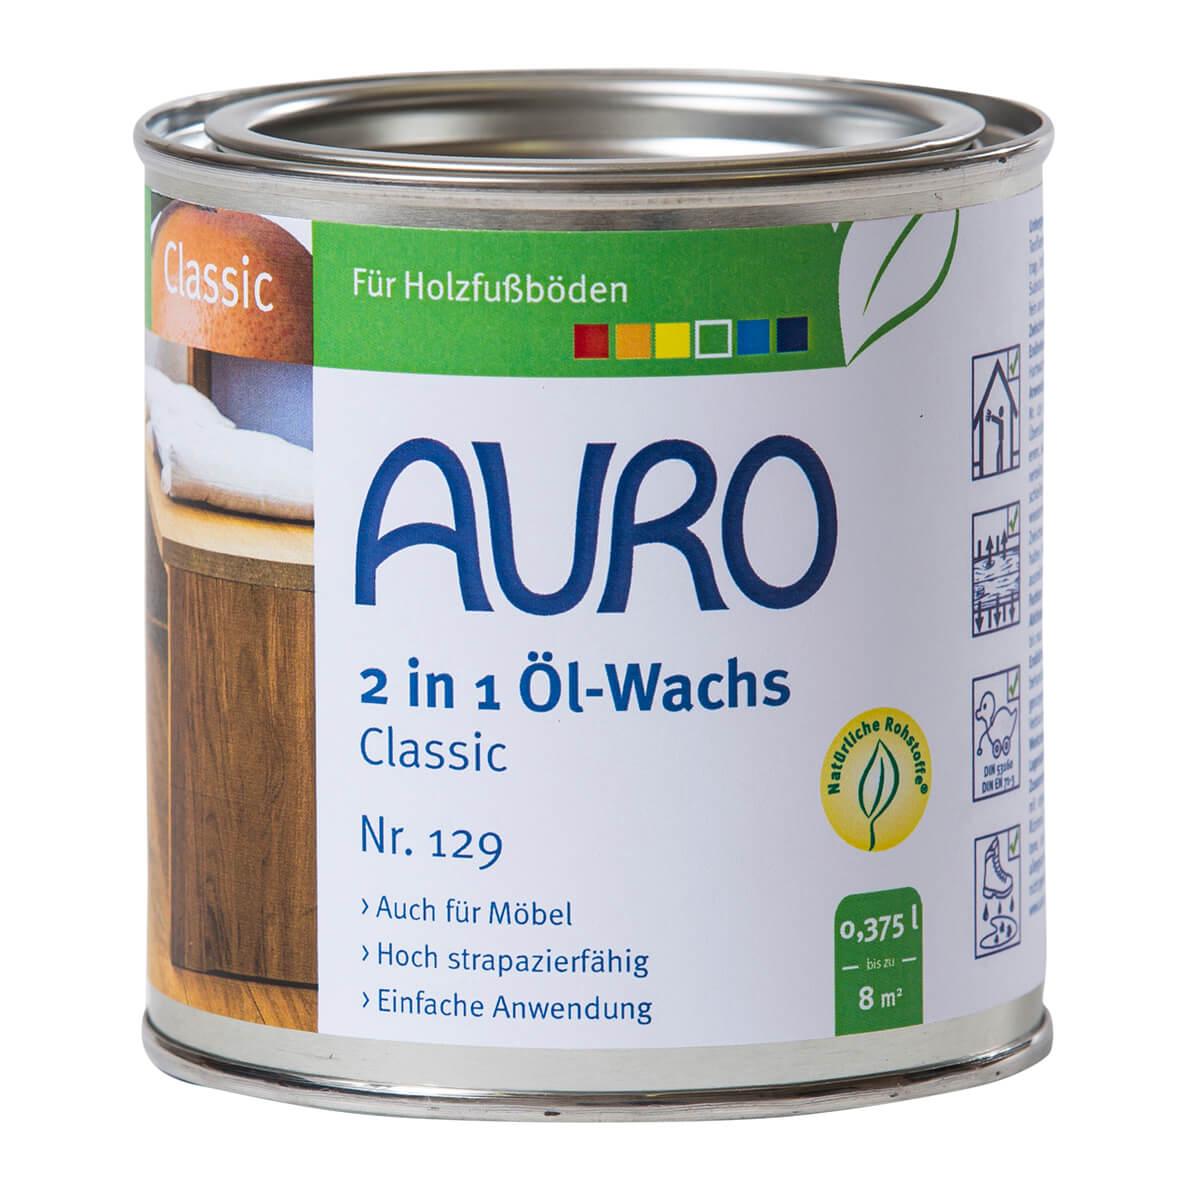 AURO 2 in 1 Öl-Wachs ° Classic